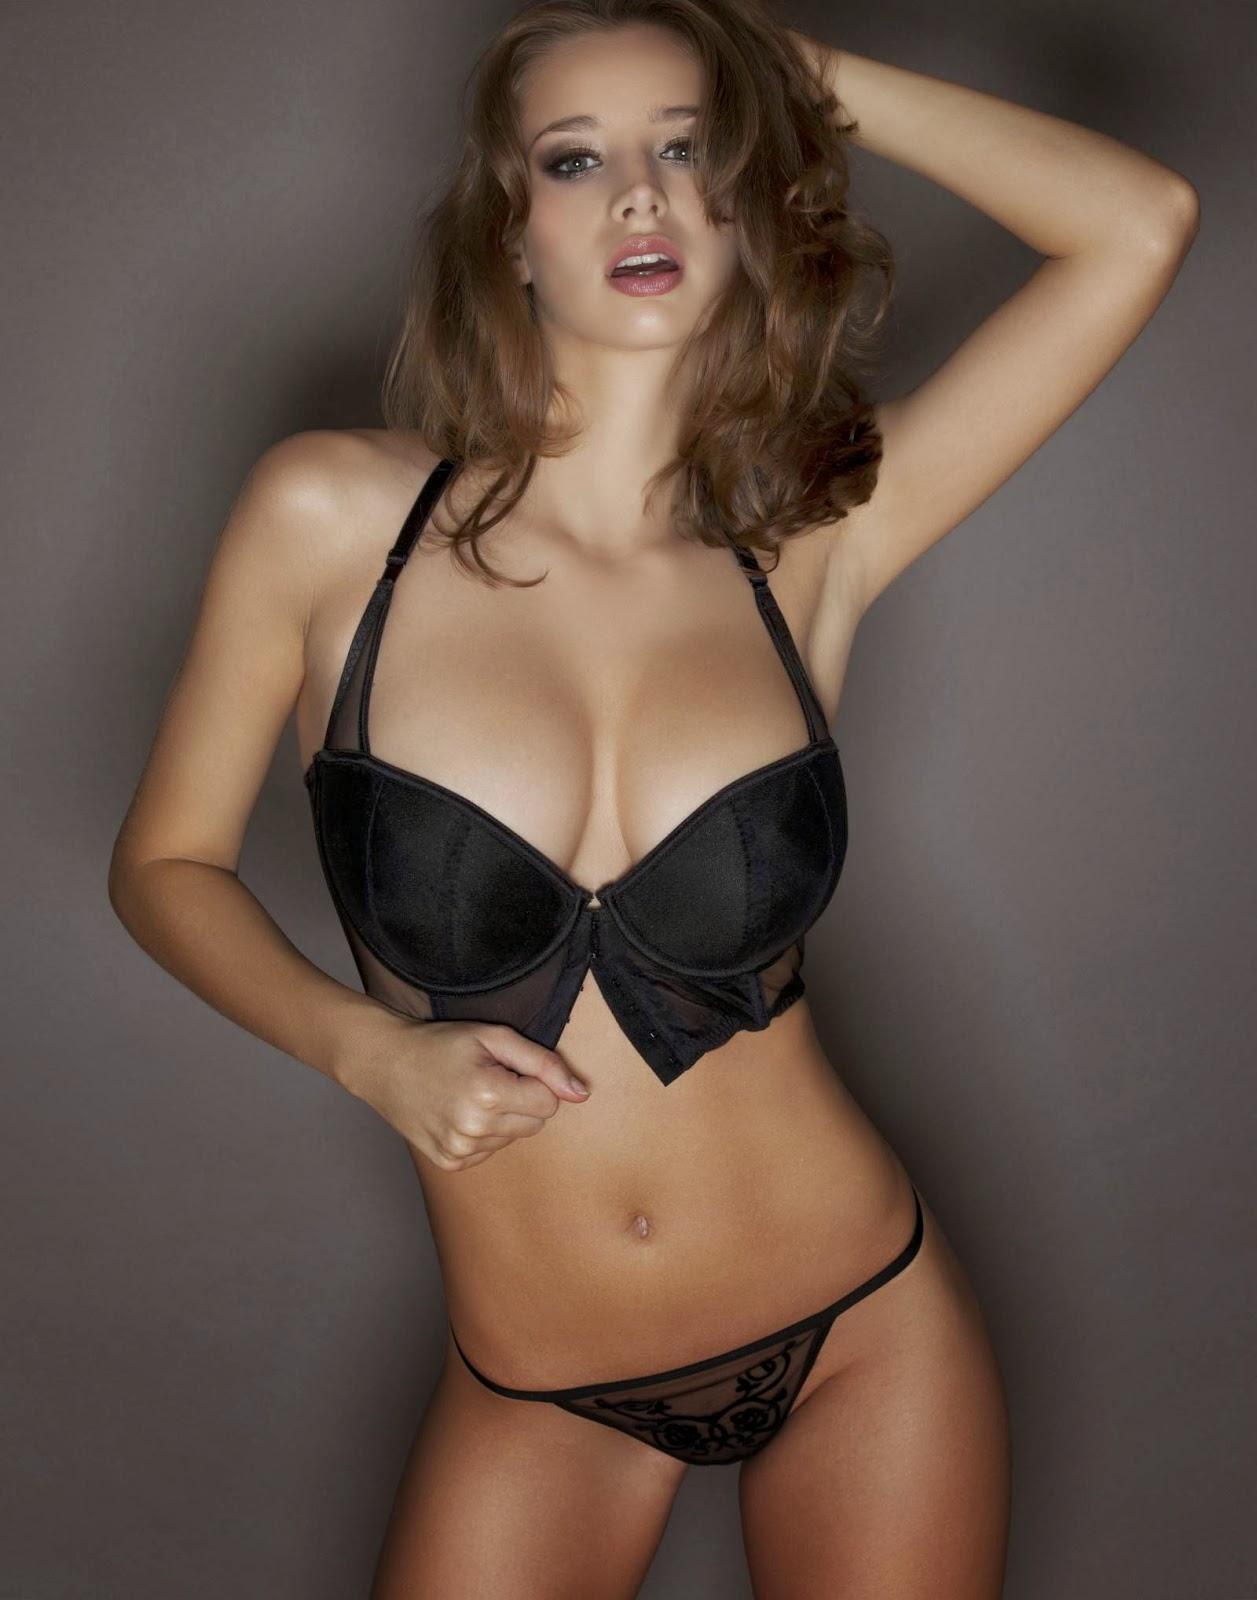 Kelly seymour tits nudes (62 pics)